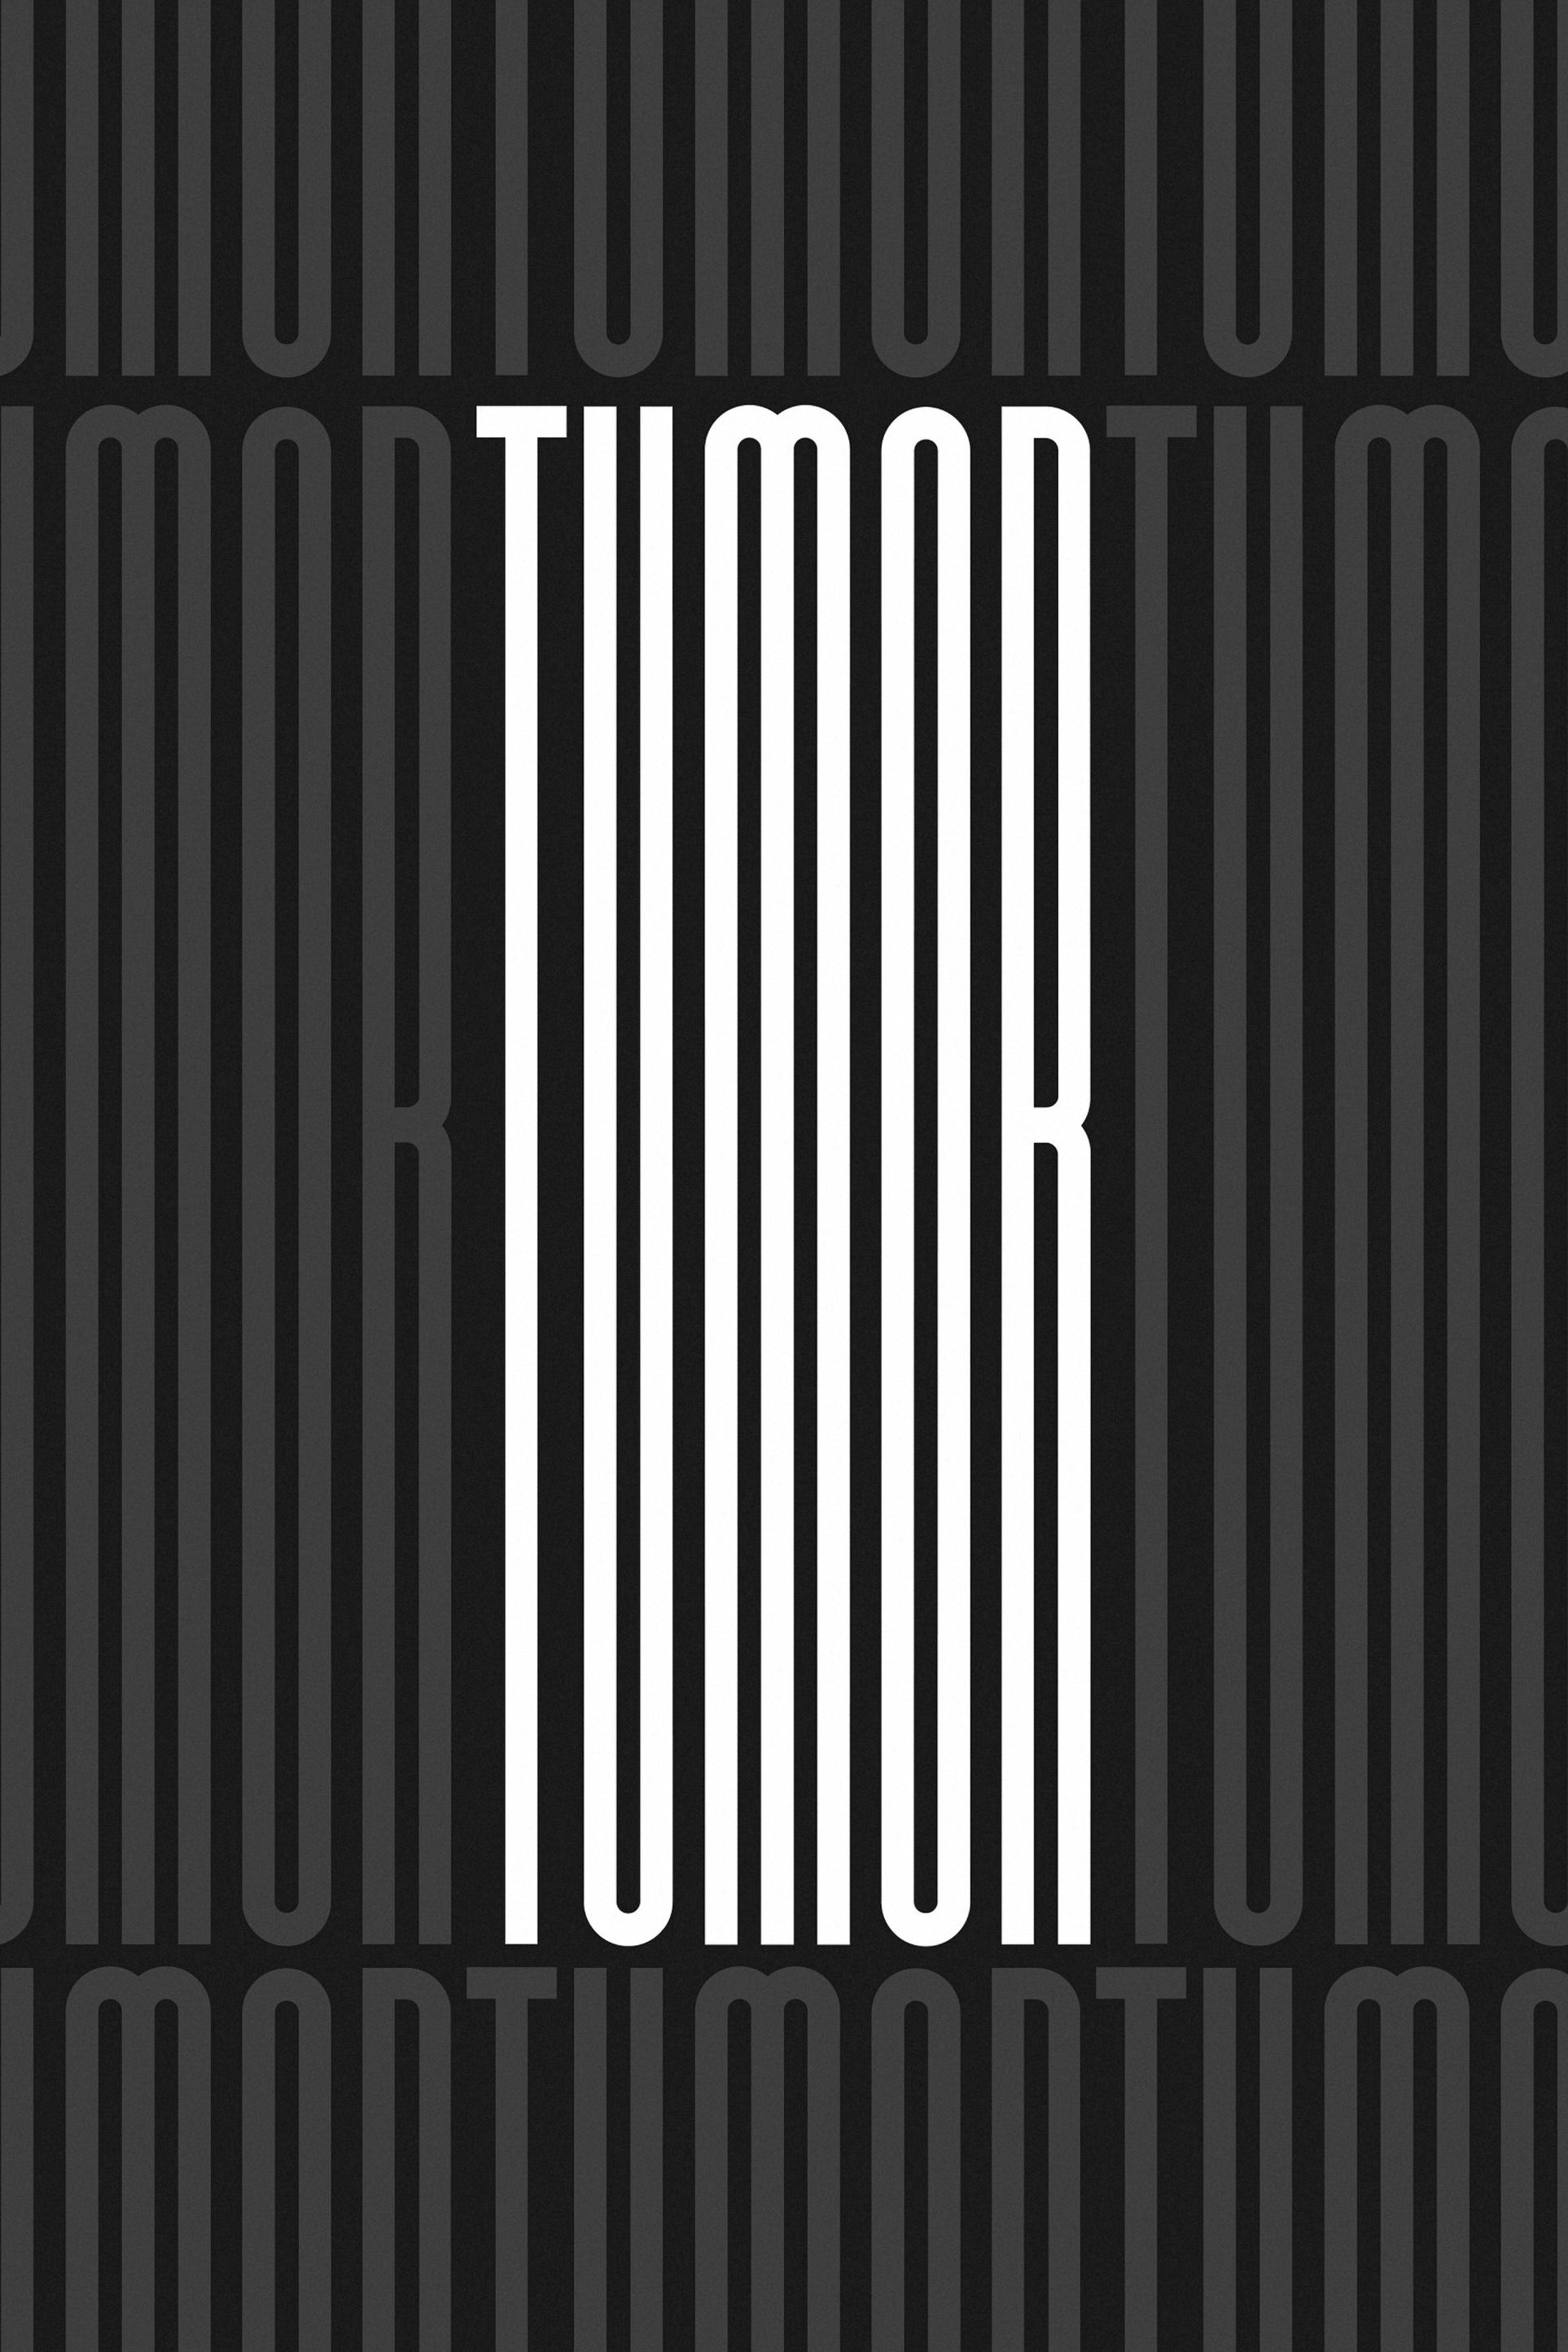 Read online Tumor comic -  Issue # TPB - 2